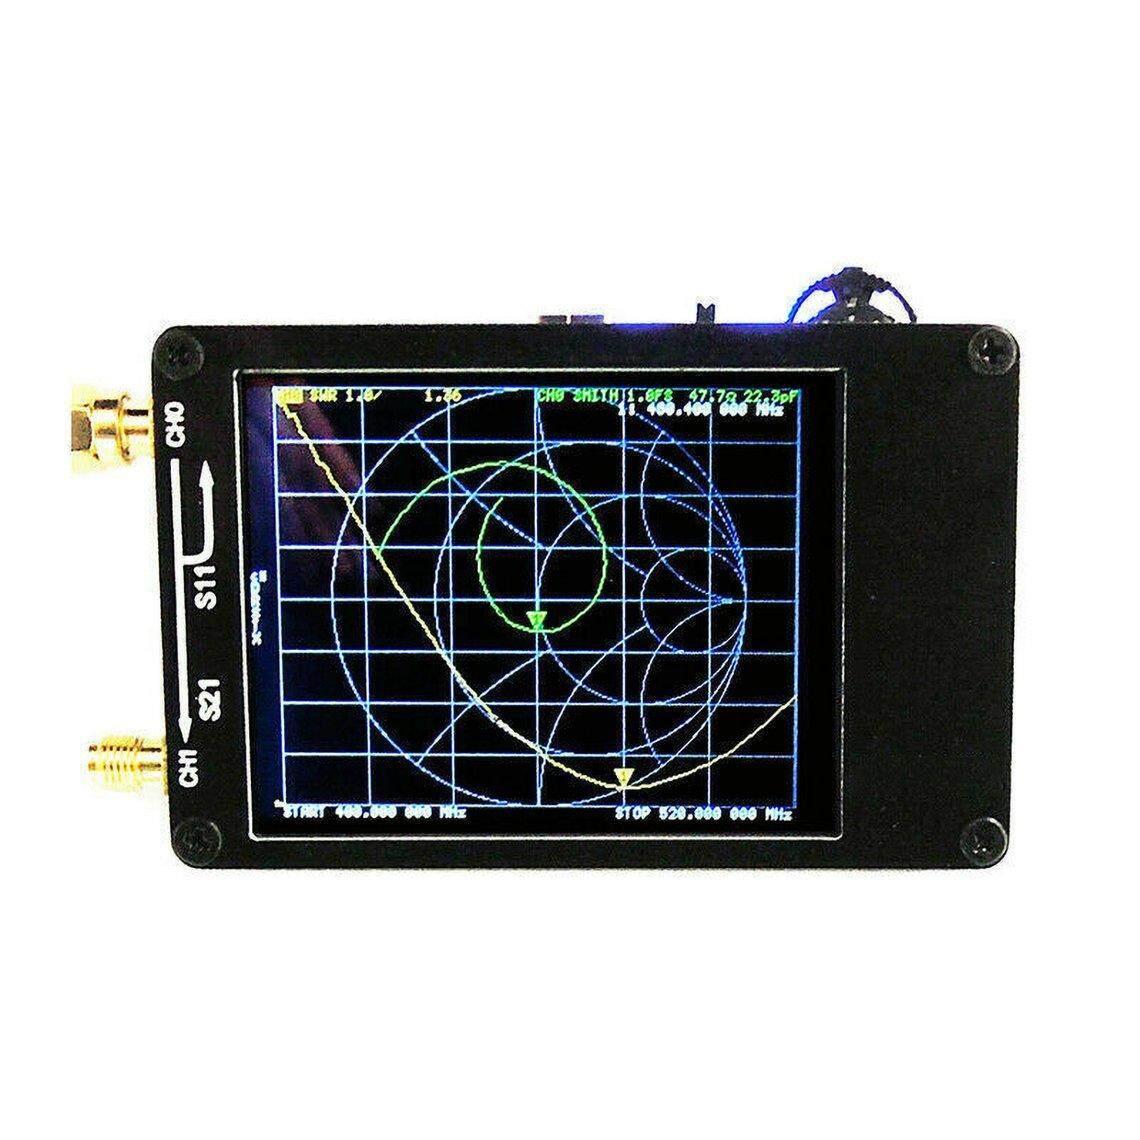 Best Discount NanoVNA 50KHz-900M HzVector Network Analyzer Assorted Kit Build In Batery